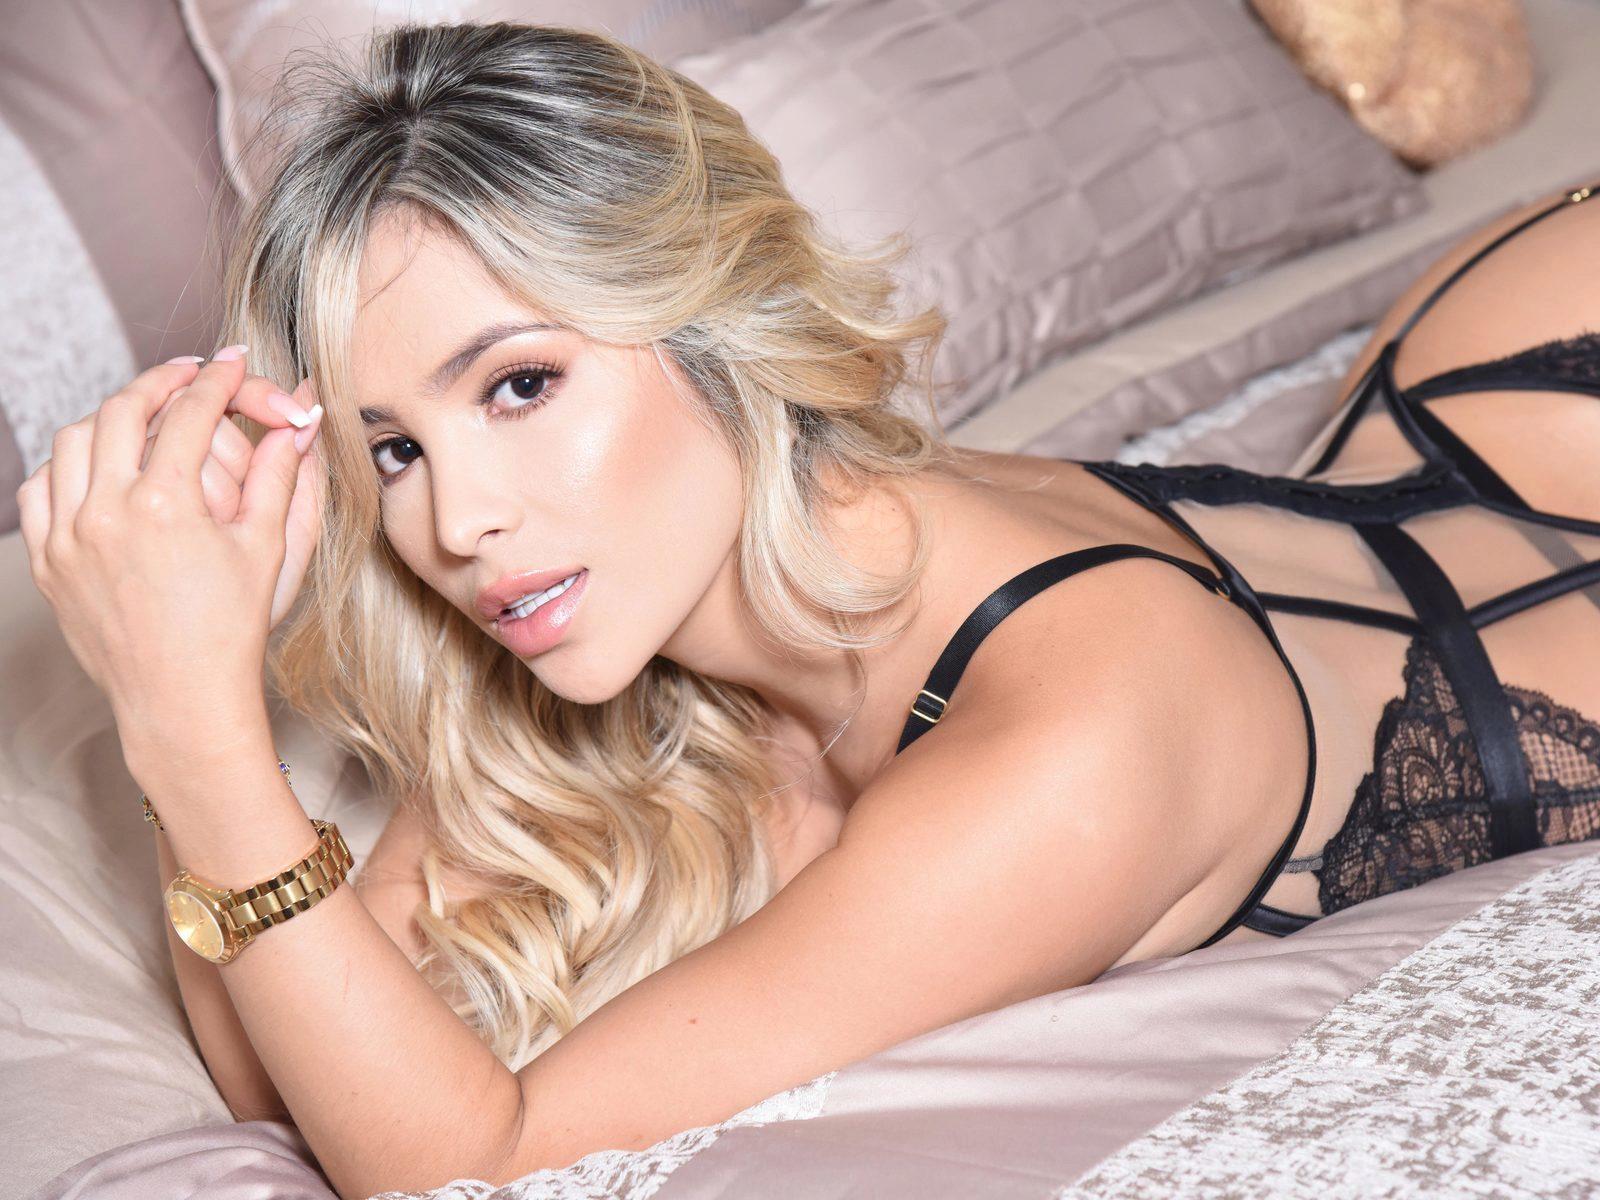 Webcam model Megan Hilton from WebPowerCam